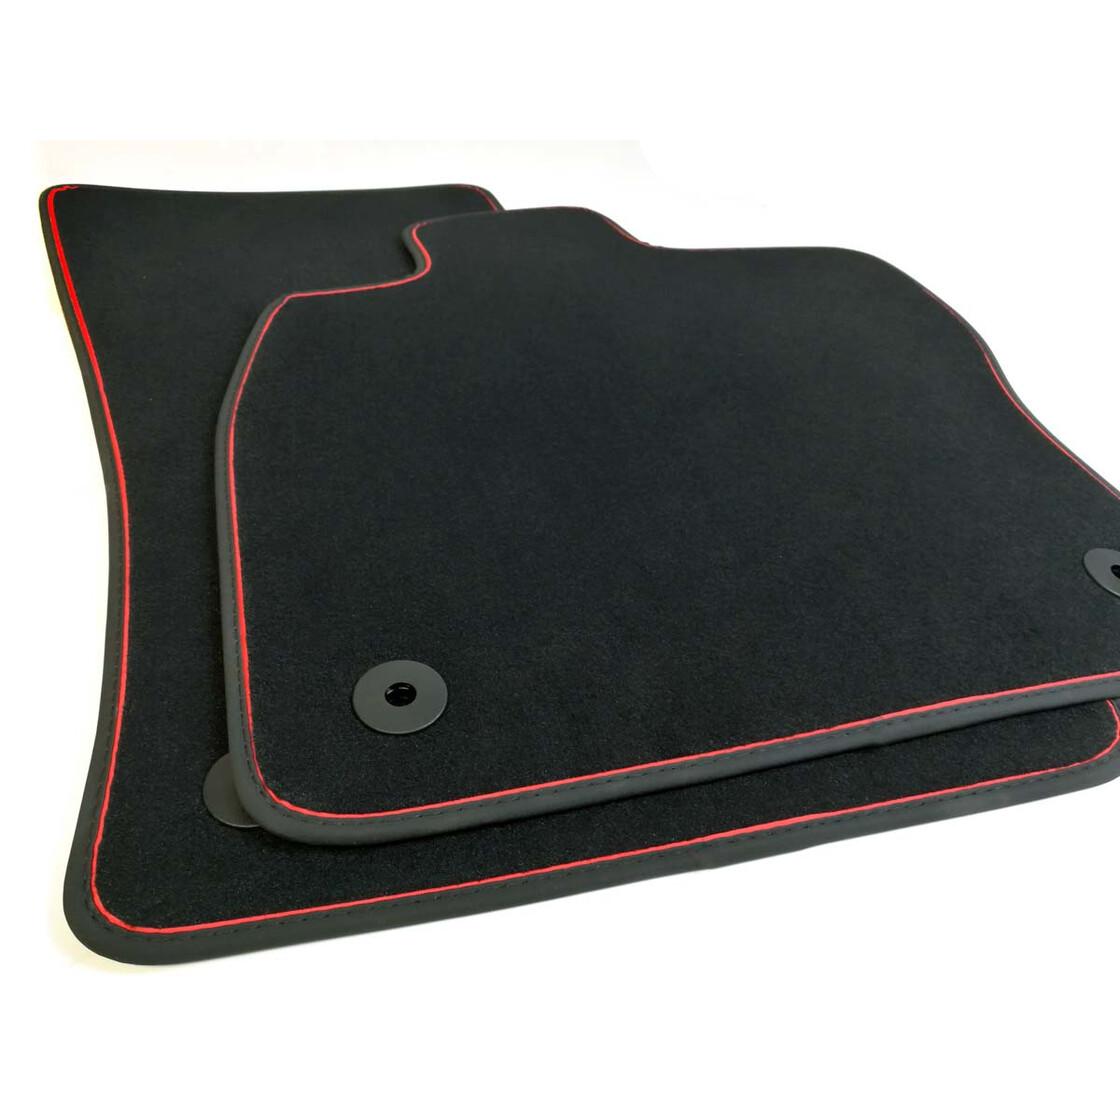 vw polo 6 fu matten premium automatten zierband rot. Black Bedroom Furniture Sets. Home Design Ideas